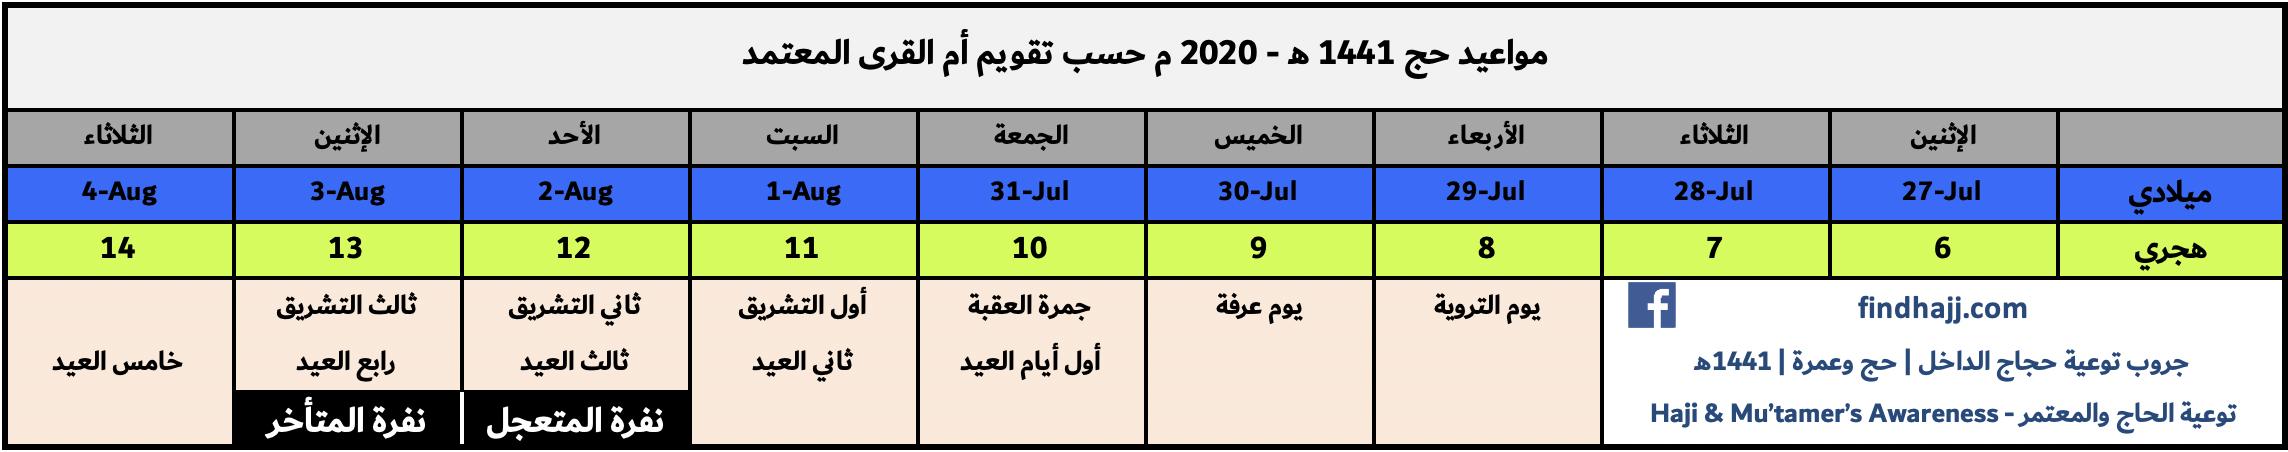 Hajj 1441 - 2020